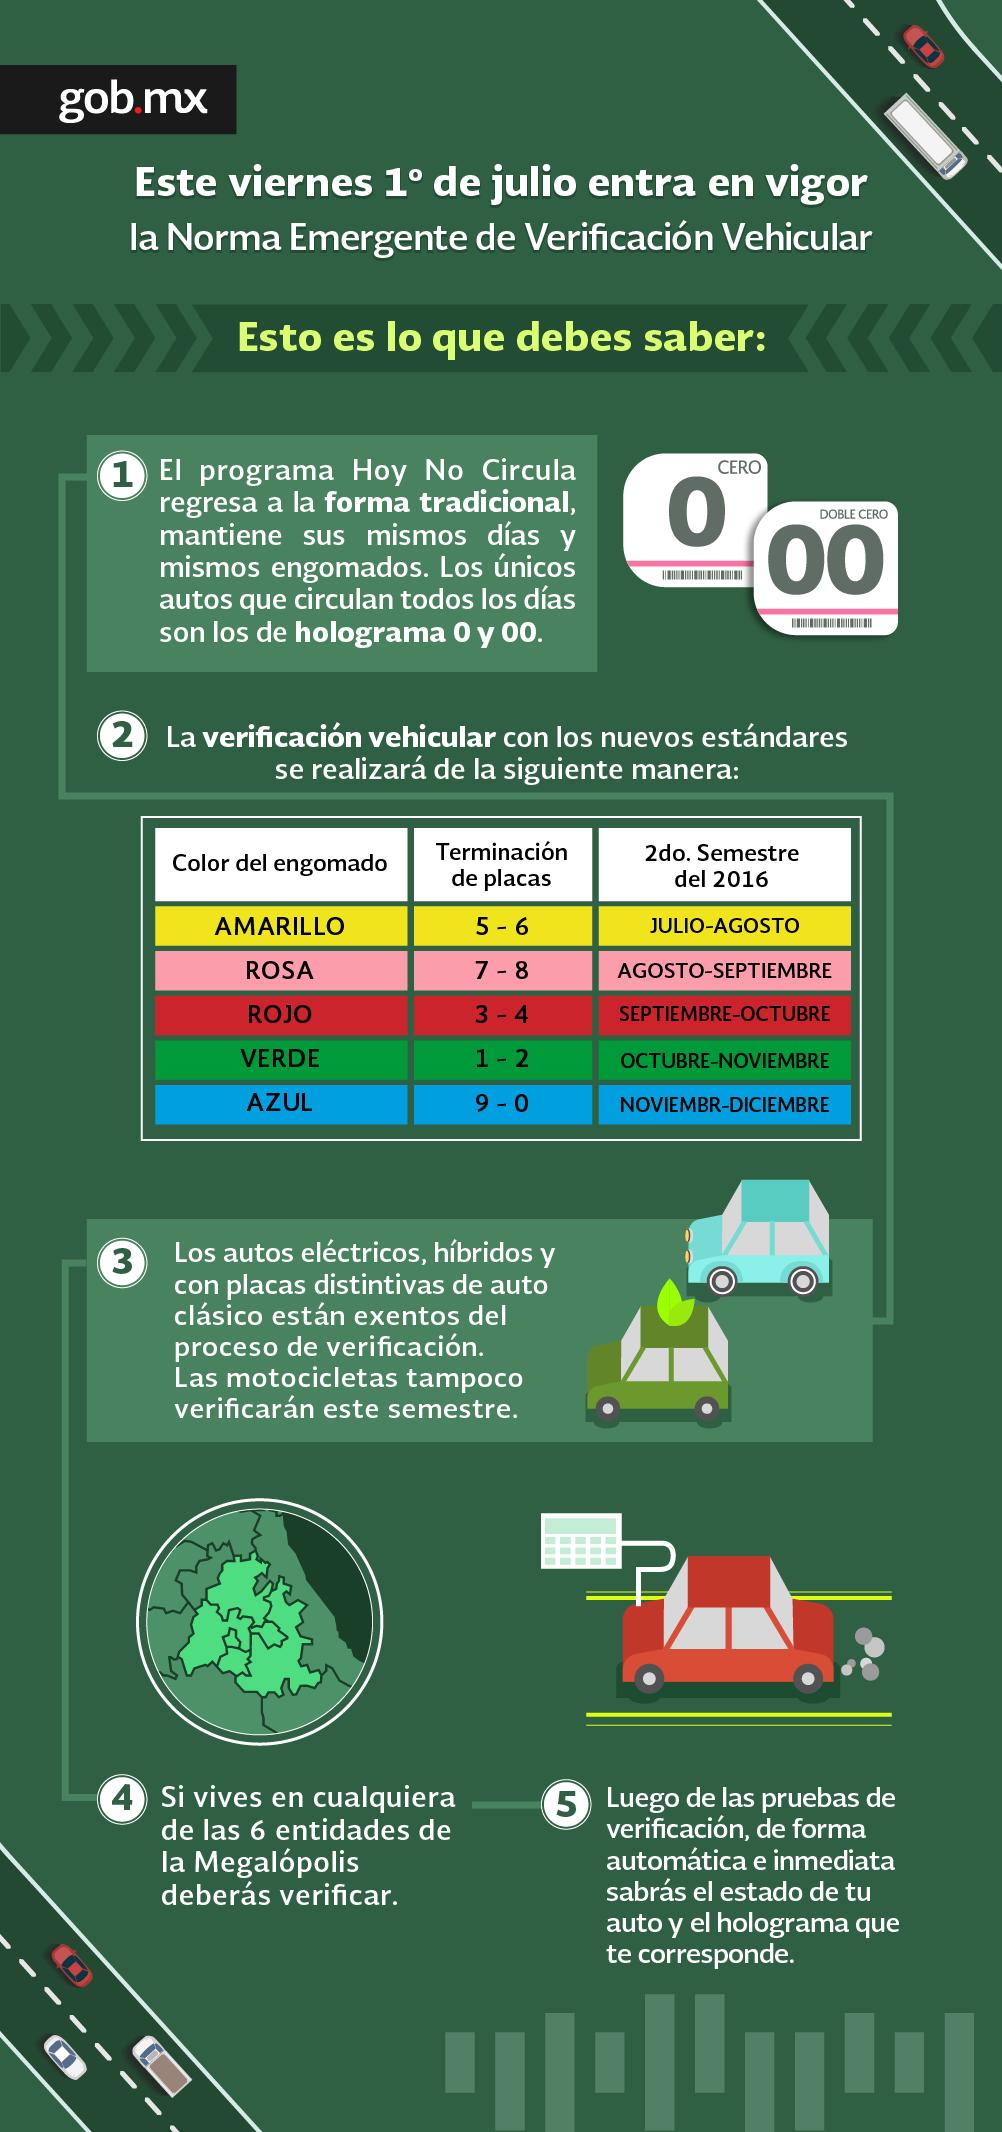 Verifiacion Vehicular